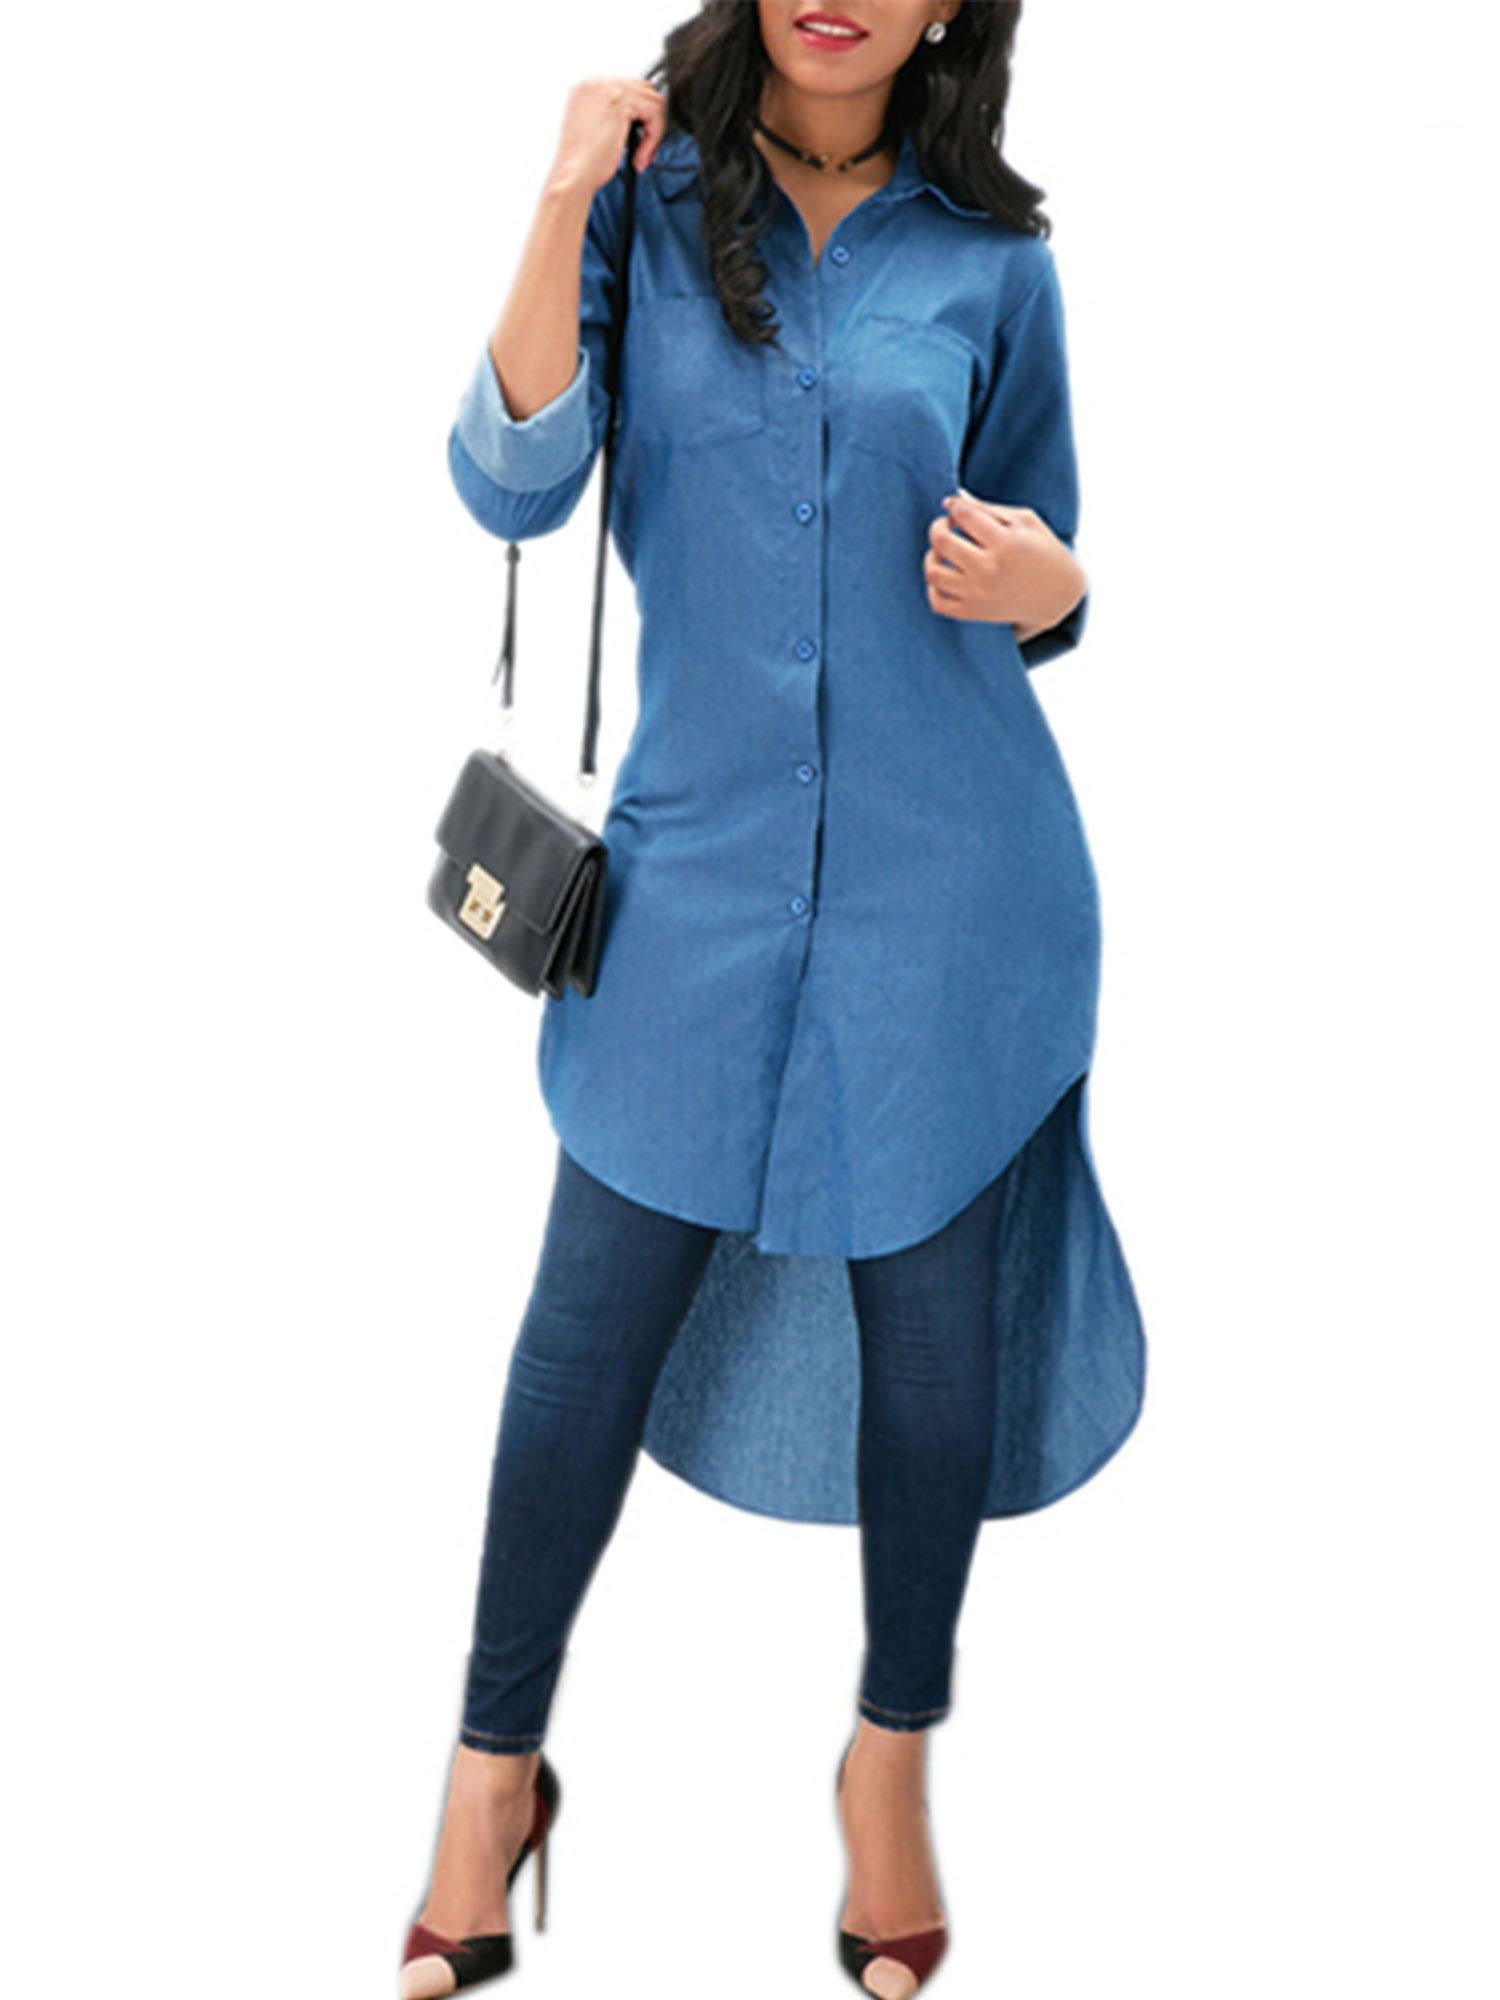 Women Autum Long Sleeve Mini Dress OL Ladies Casual Work Plain Shirt Blouse Tops